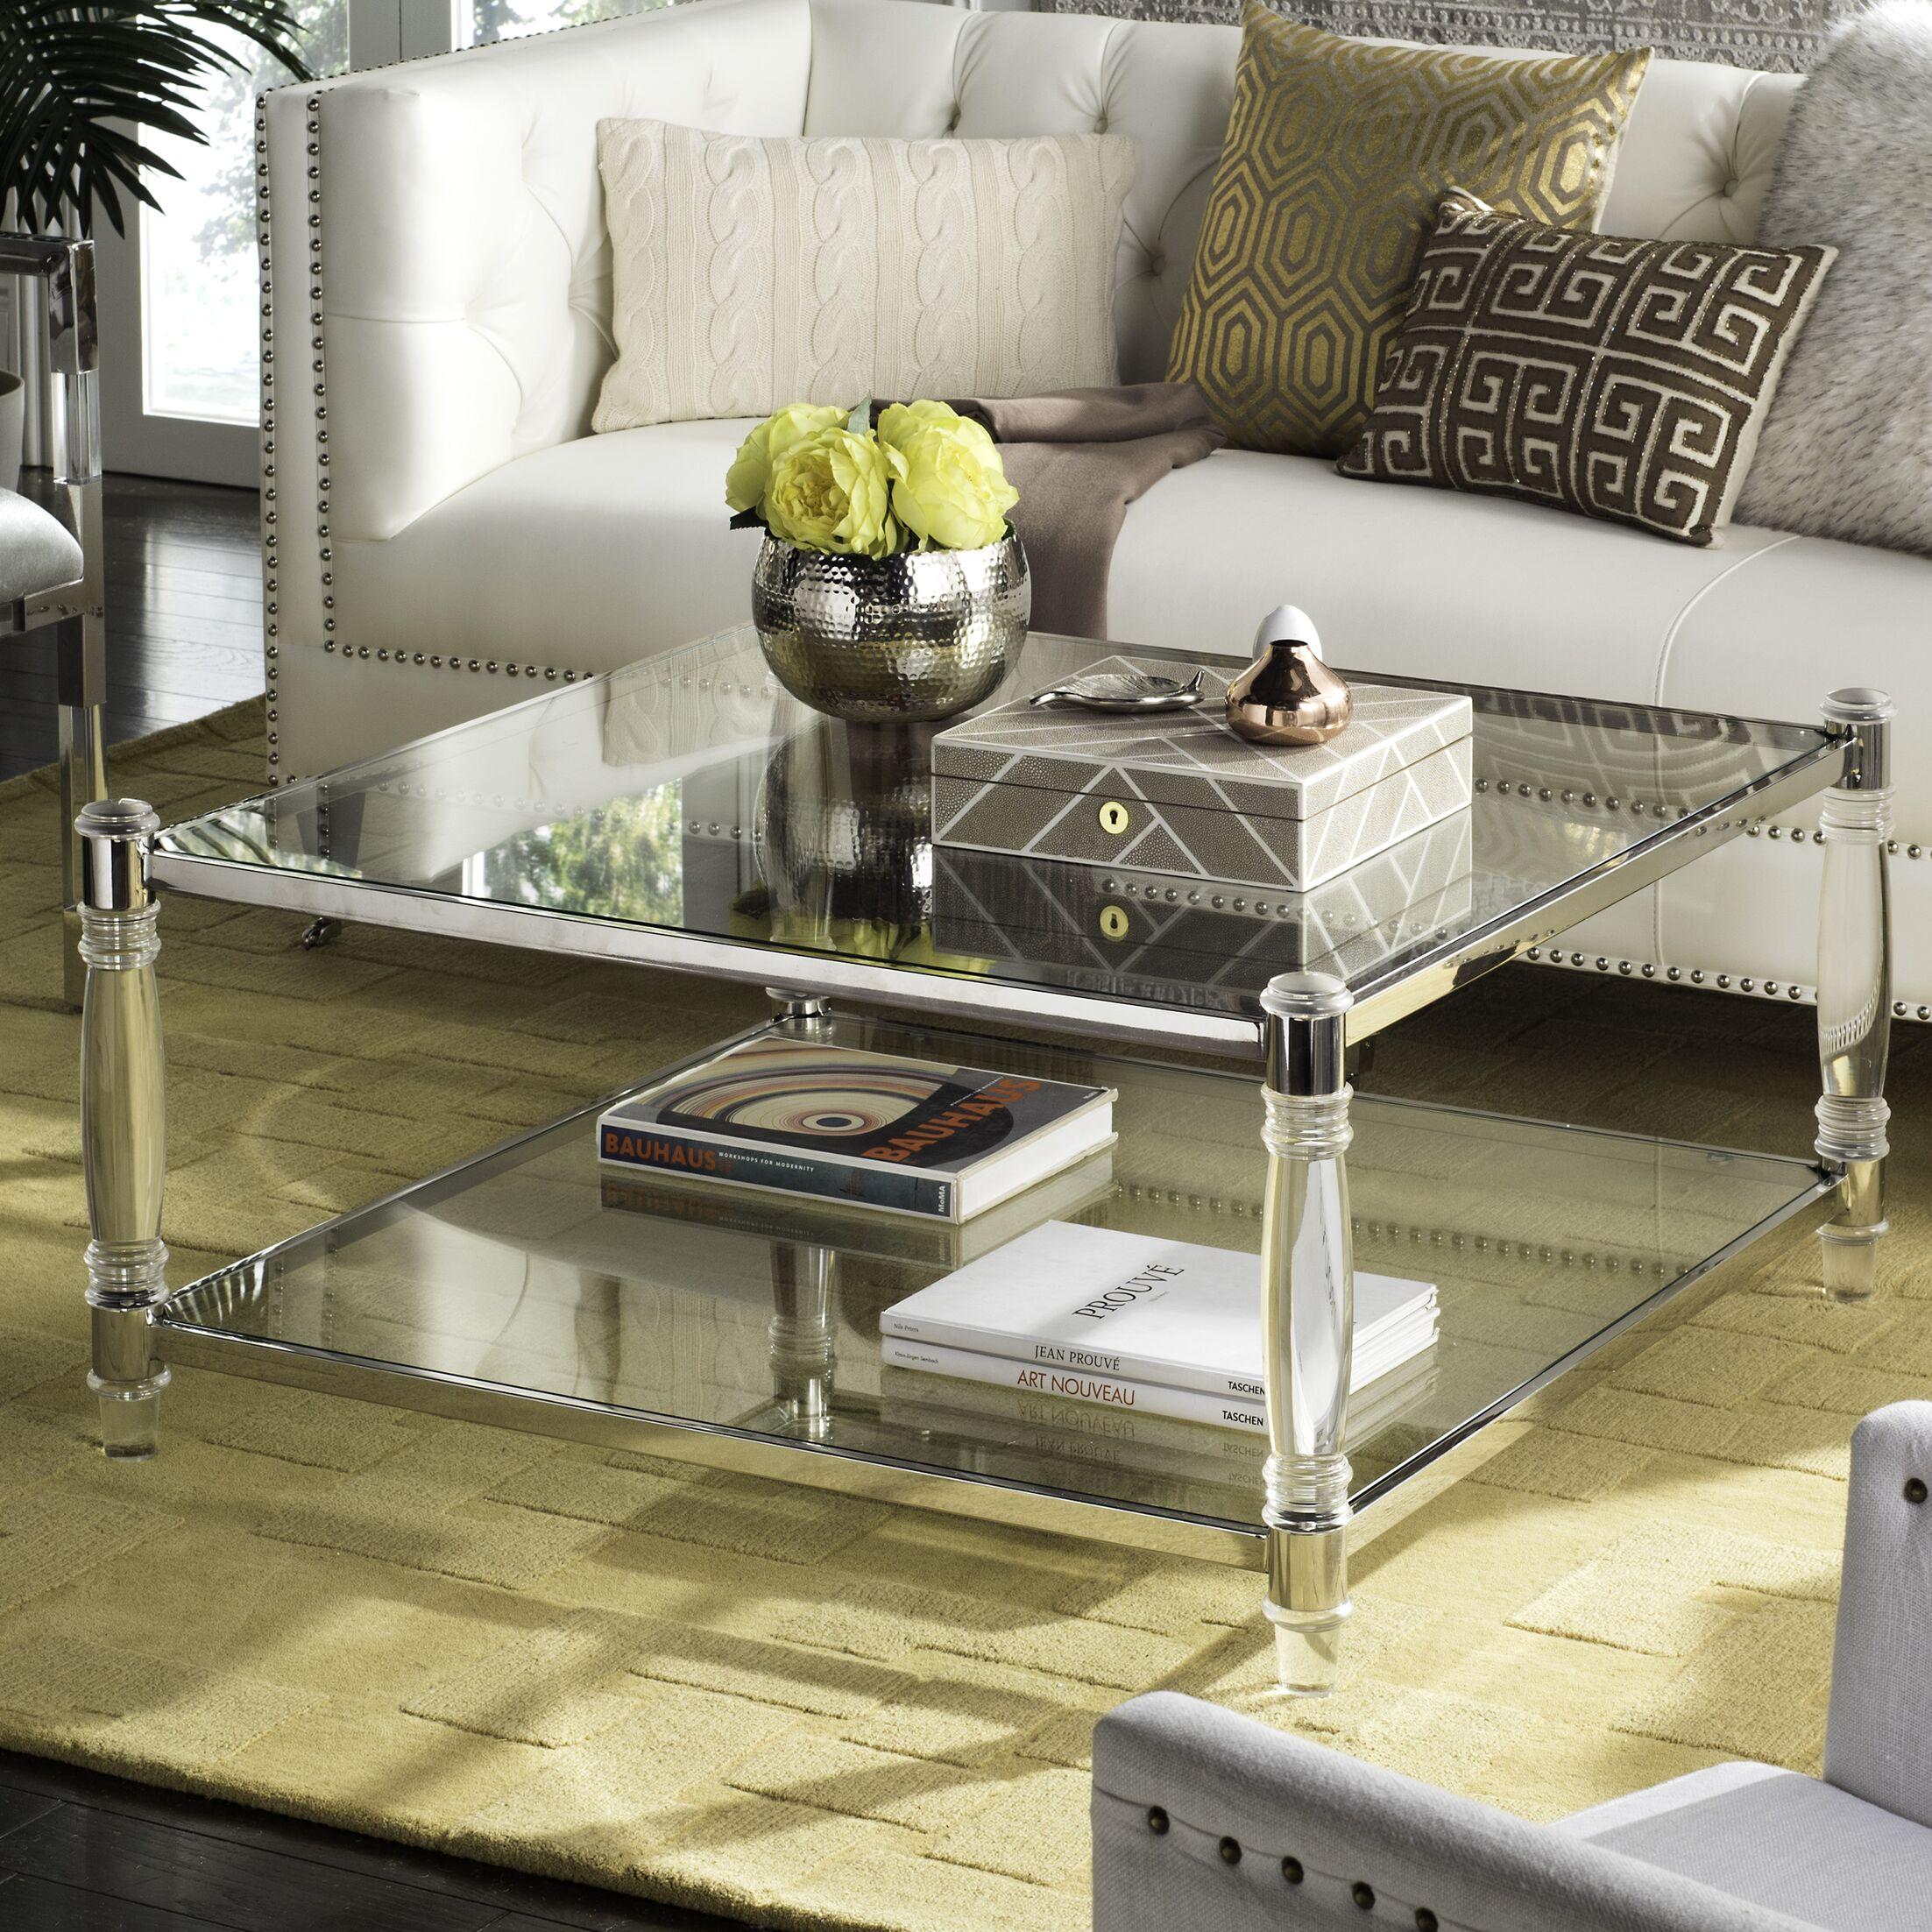 Perkins Coffee Table Color: Silver